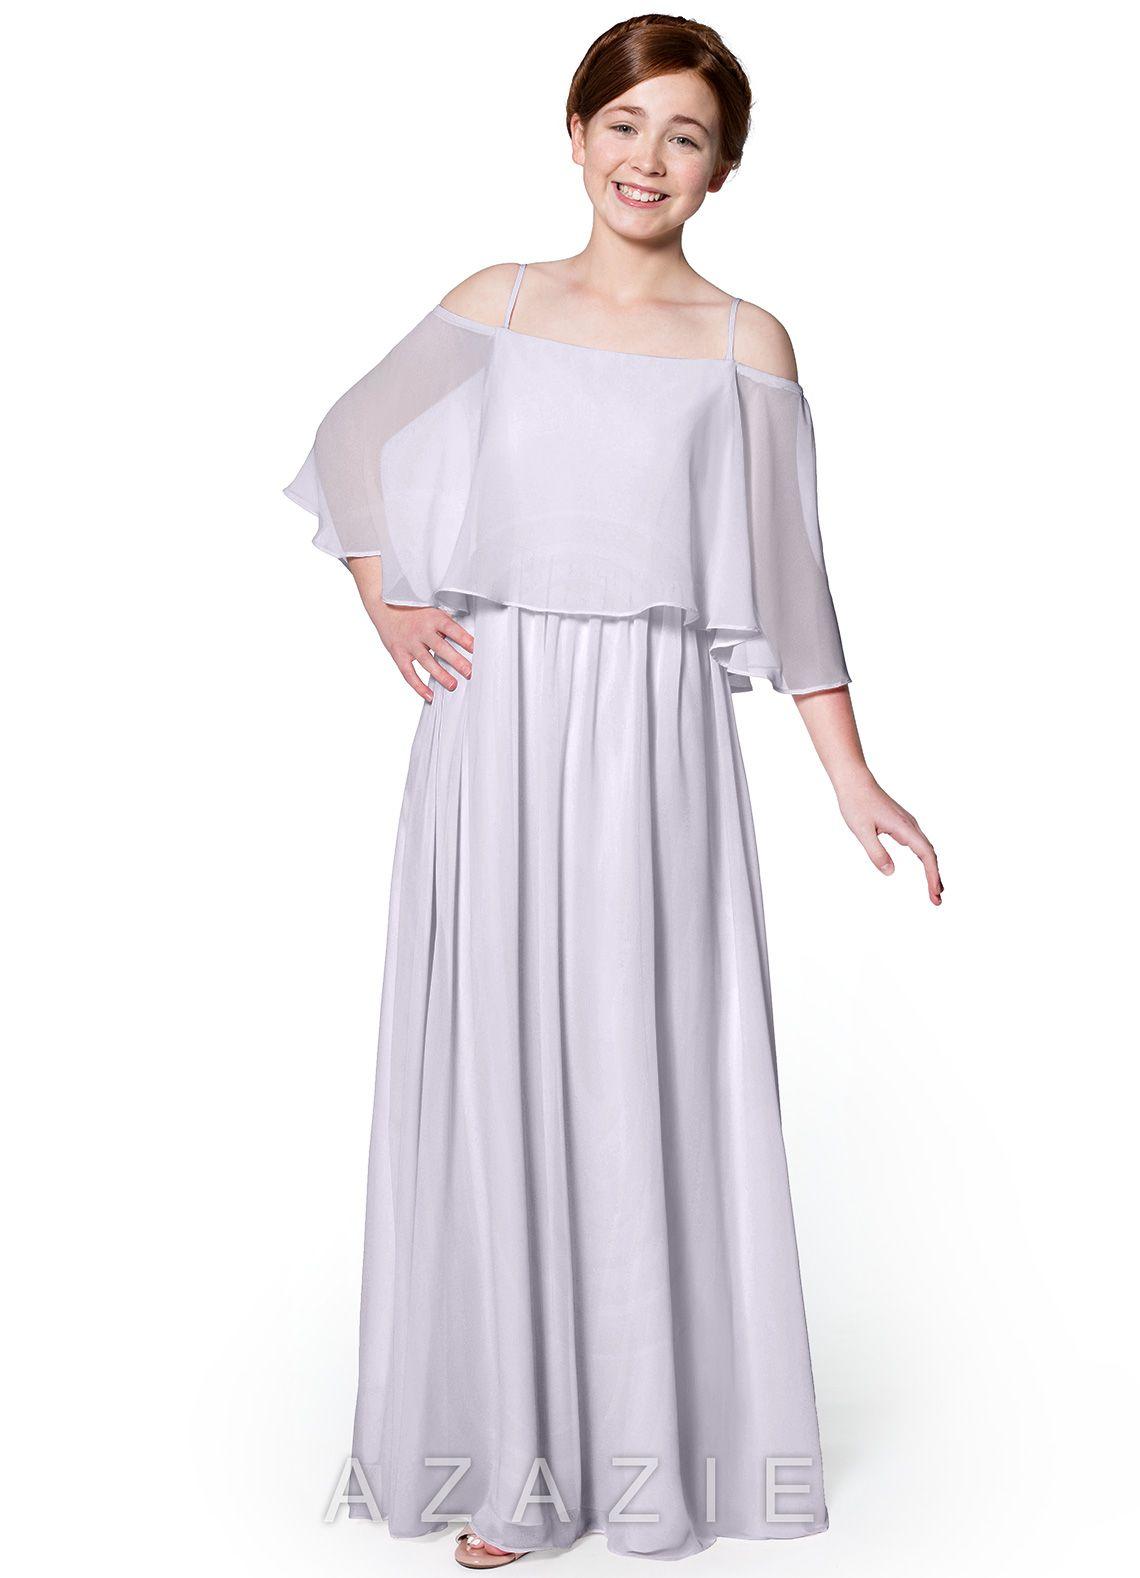 7bf849a2cc5 Azazie Natalie JBD Junior Bridesmaid Dress